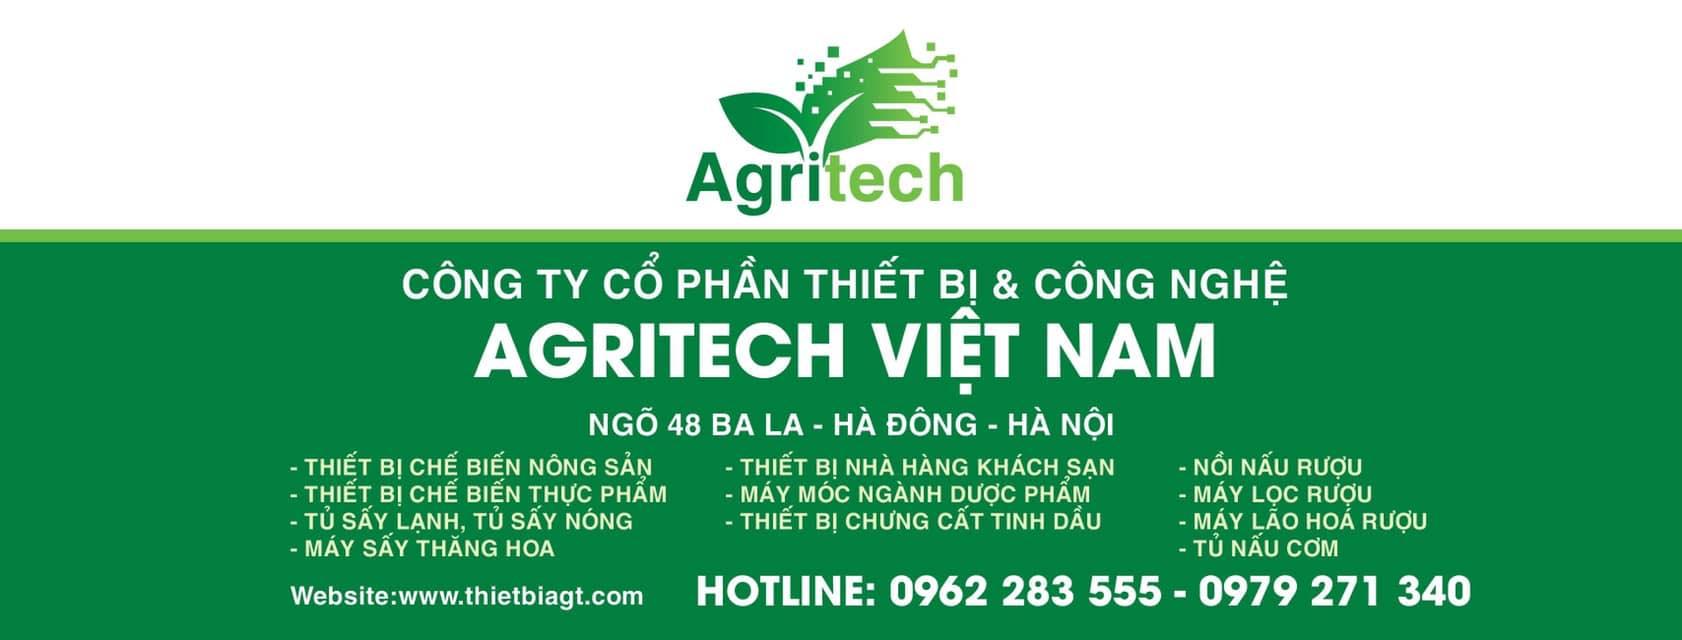 agritech vietnam baner